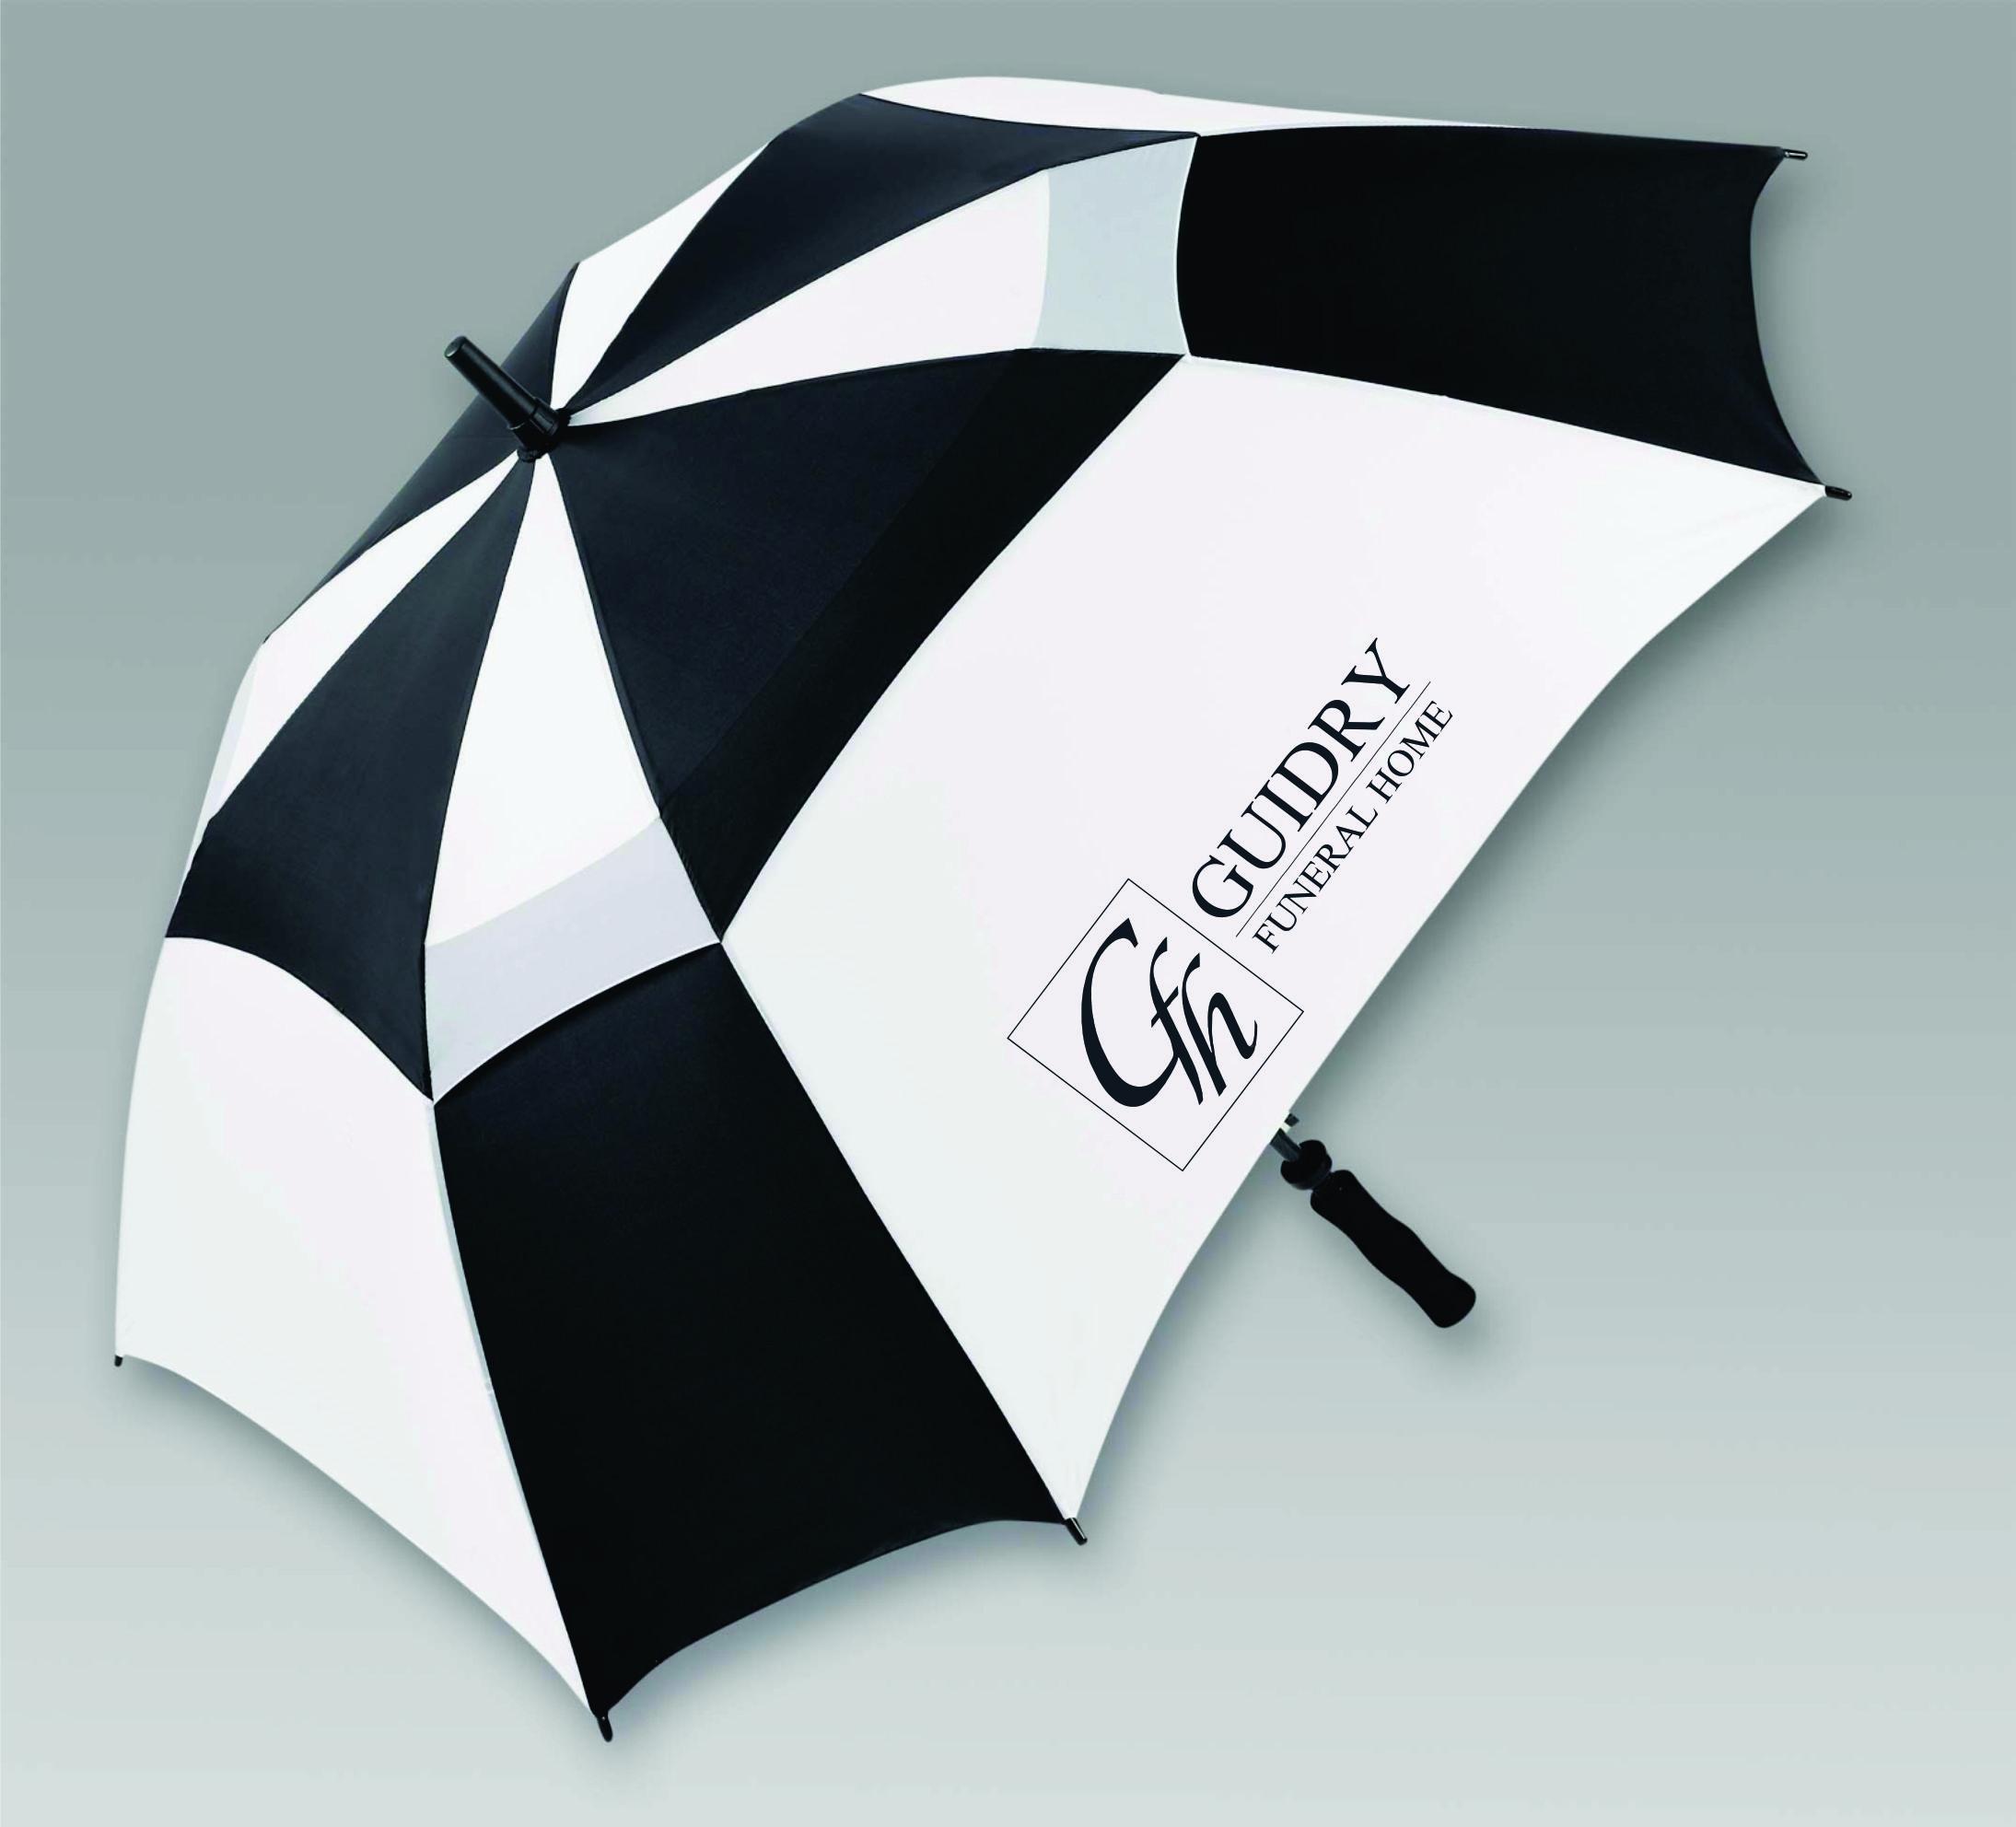 e85437fb2 Style #ROPSG62 – 62″ Premium Vented Square Golf Umbrella – Double Canopy  Design – Comfortable Suregrip Foam Handle – Fiberglass Shaft – Automatic  Push ...